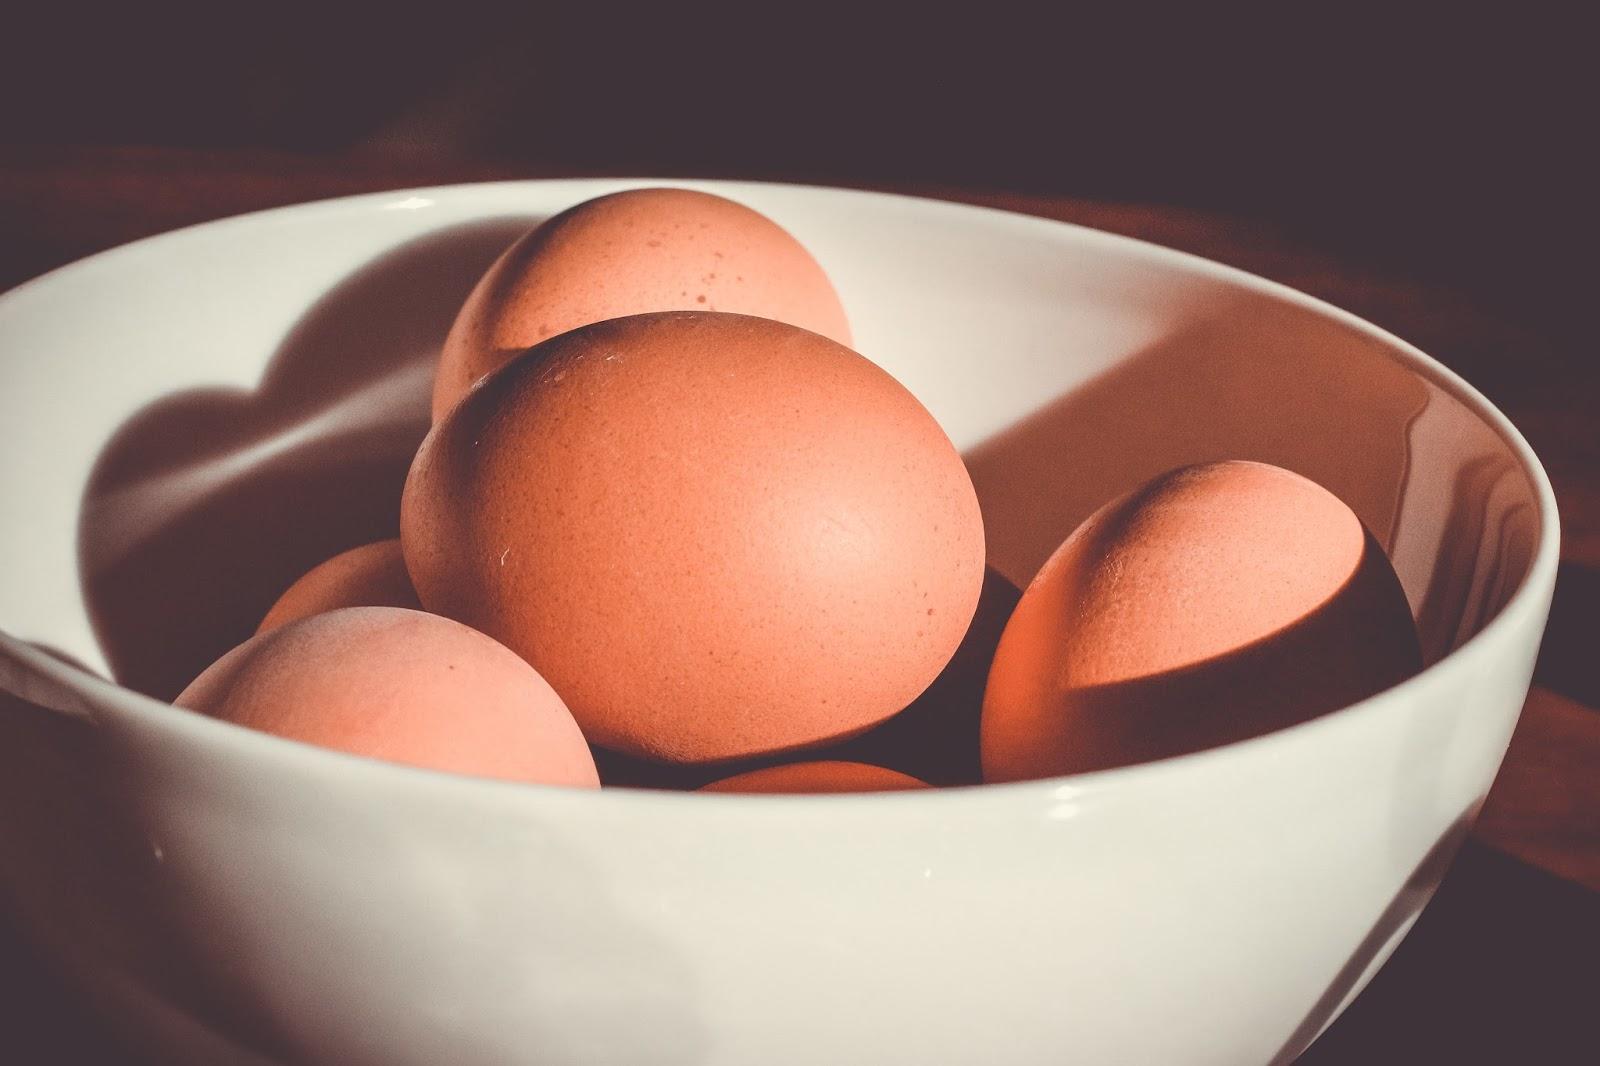 How To Properly Boil An Egg | SterlingTerrell.net